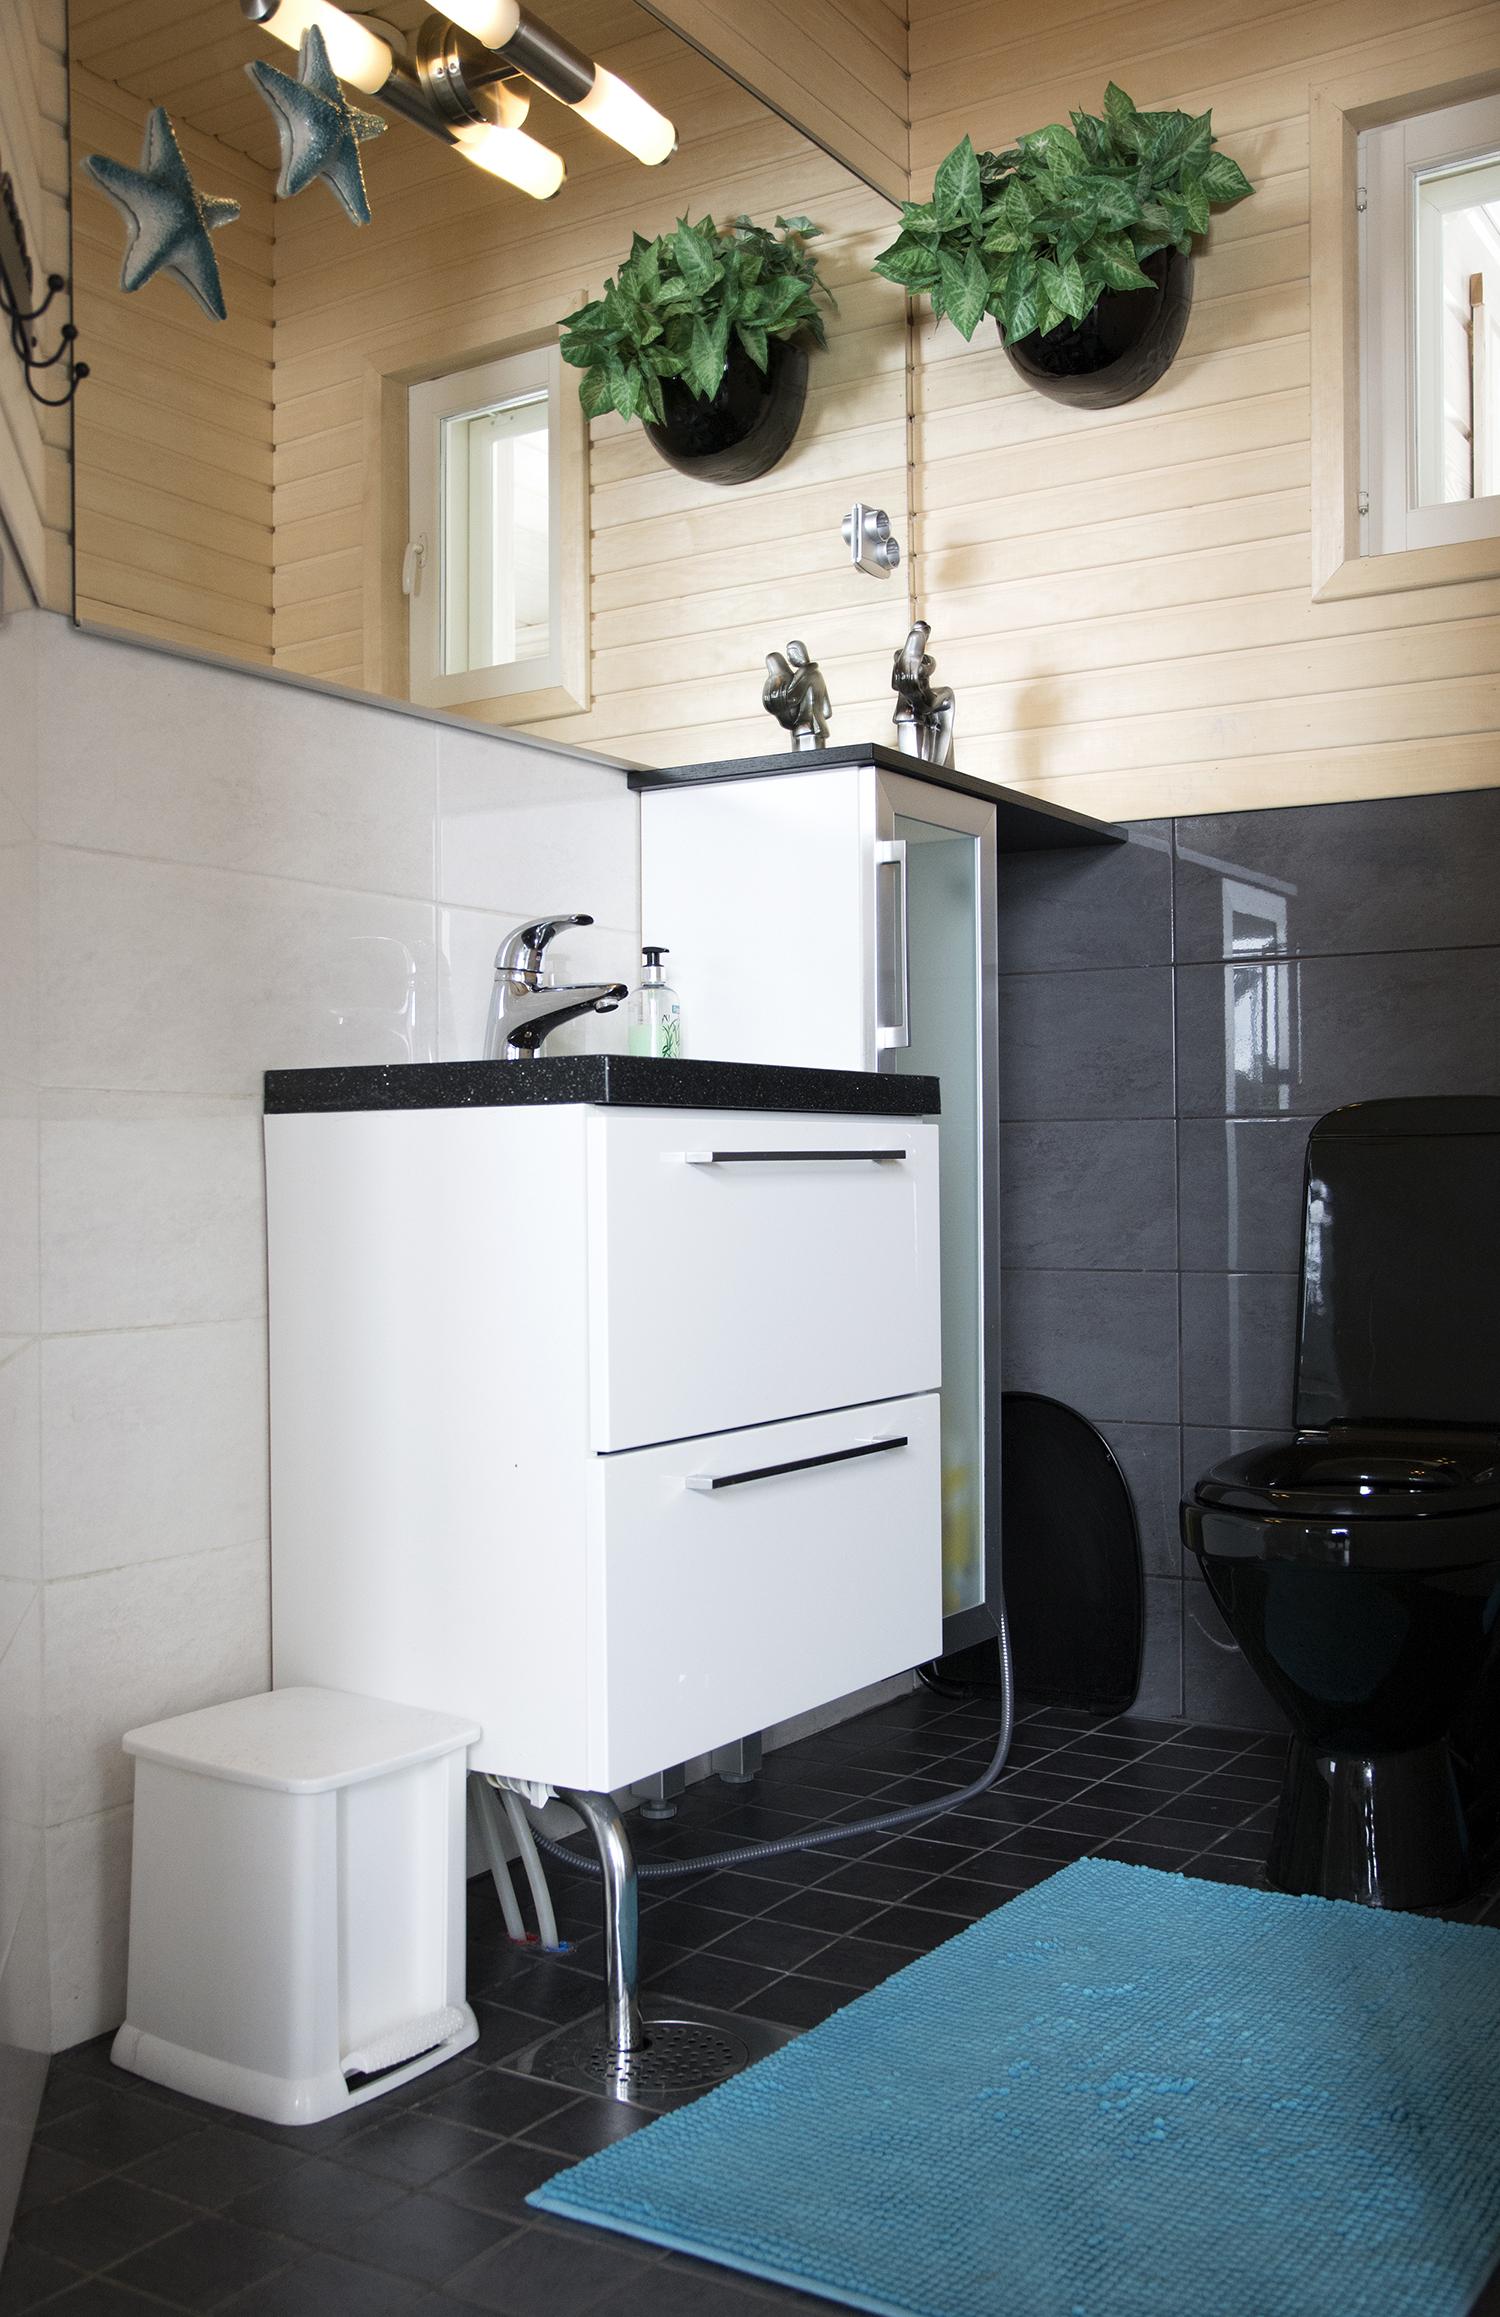 Tervaharju erillis-wc